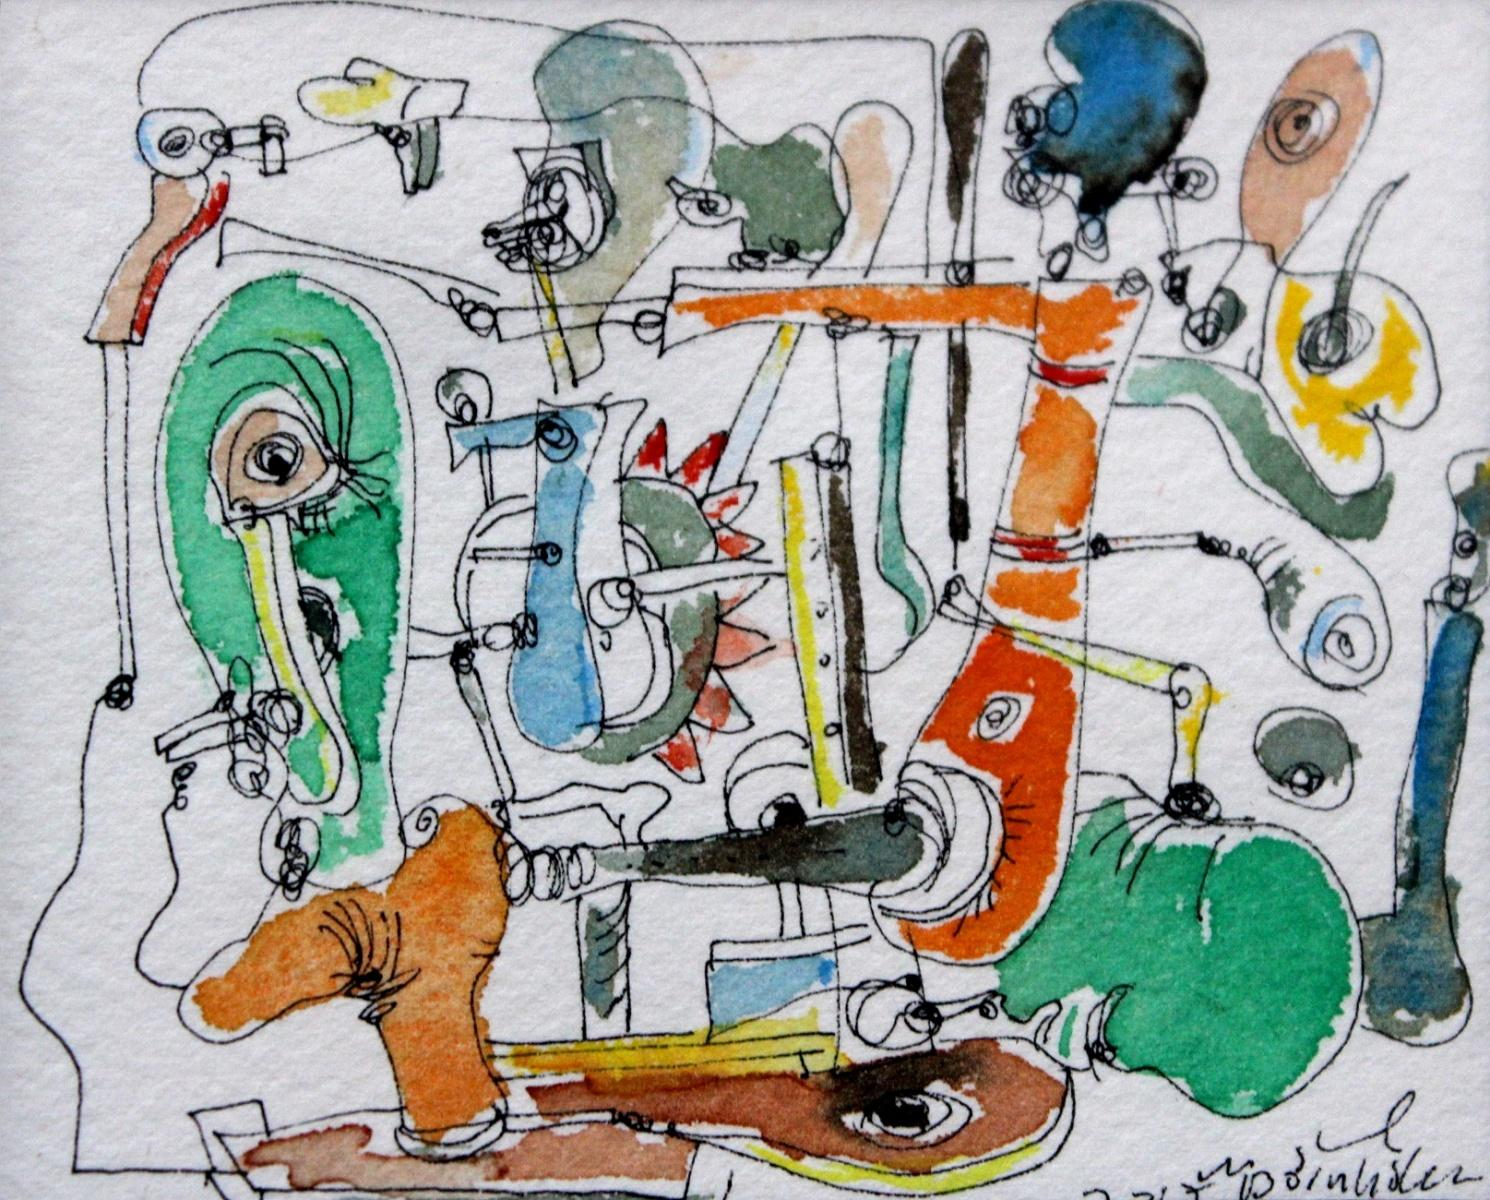 Composition (Watercolour) -  Contemporary surrealist artist, Abstraction